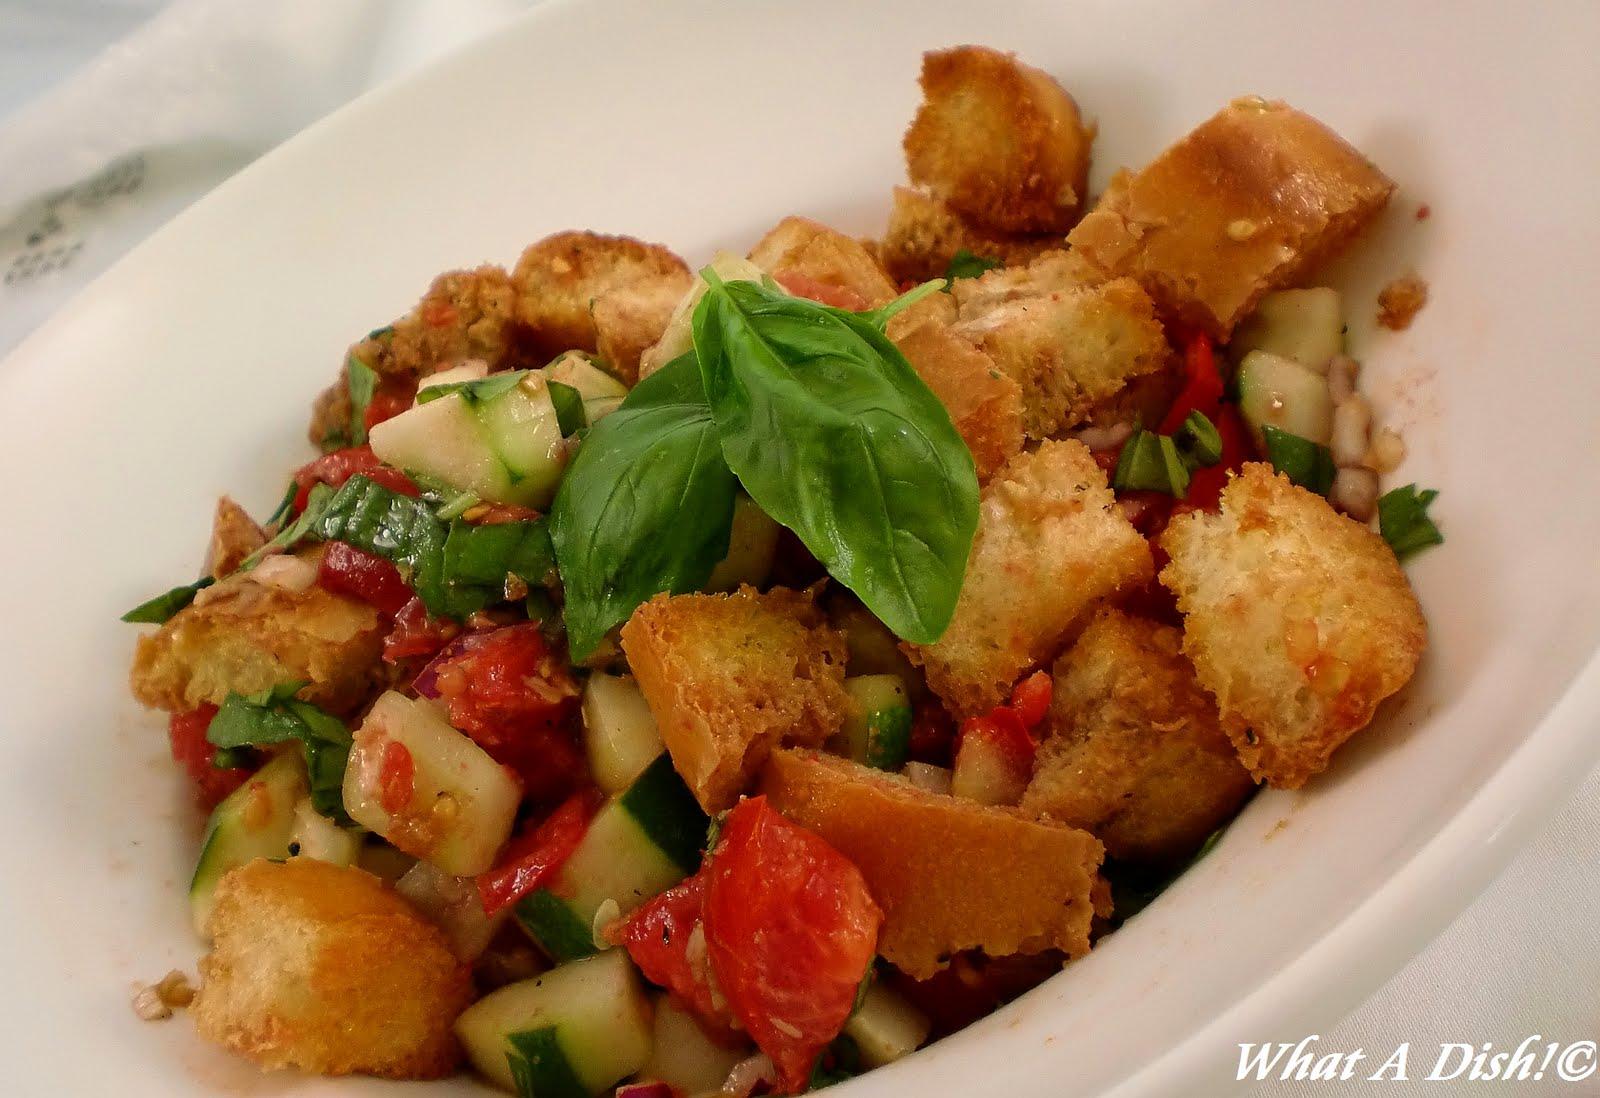 What A Dish!: Panzanella- Italian Bread Salad